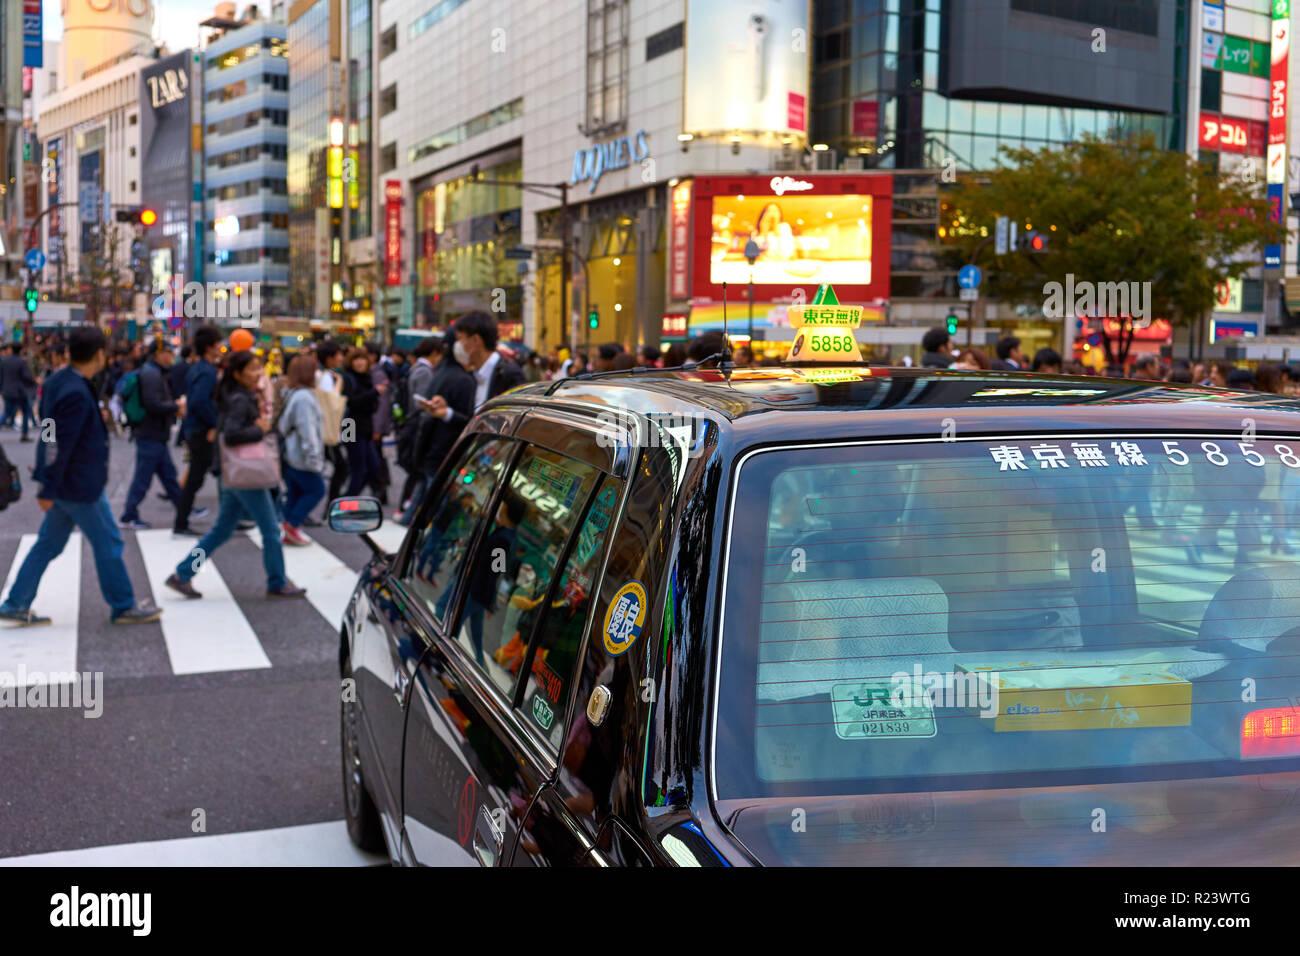 e7579ab9b Japanese taxi waiting at the Shibuya Crossing, Tokyo, Japan, Asia - Stock  Image